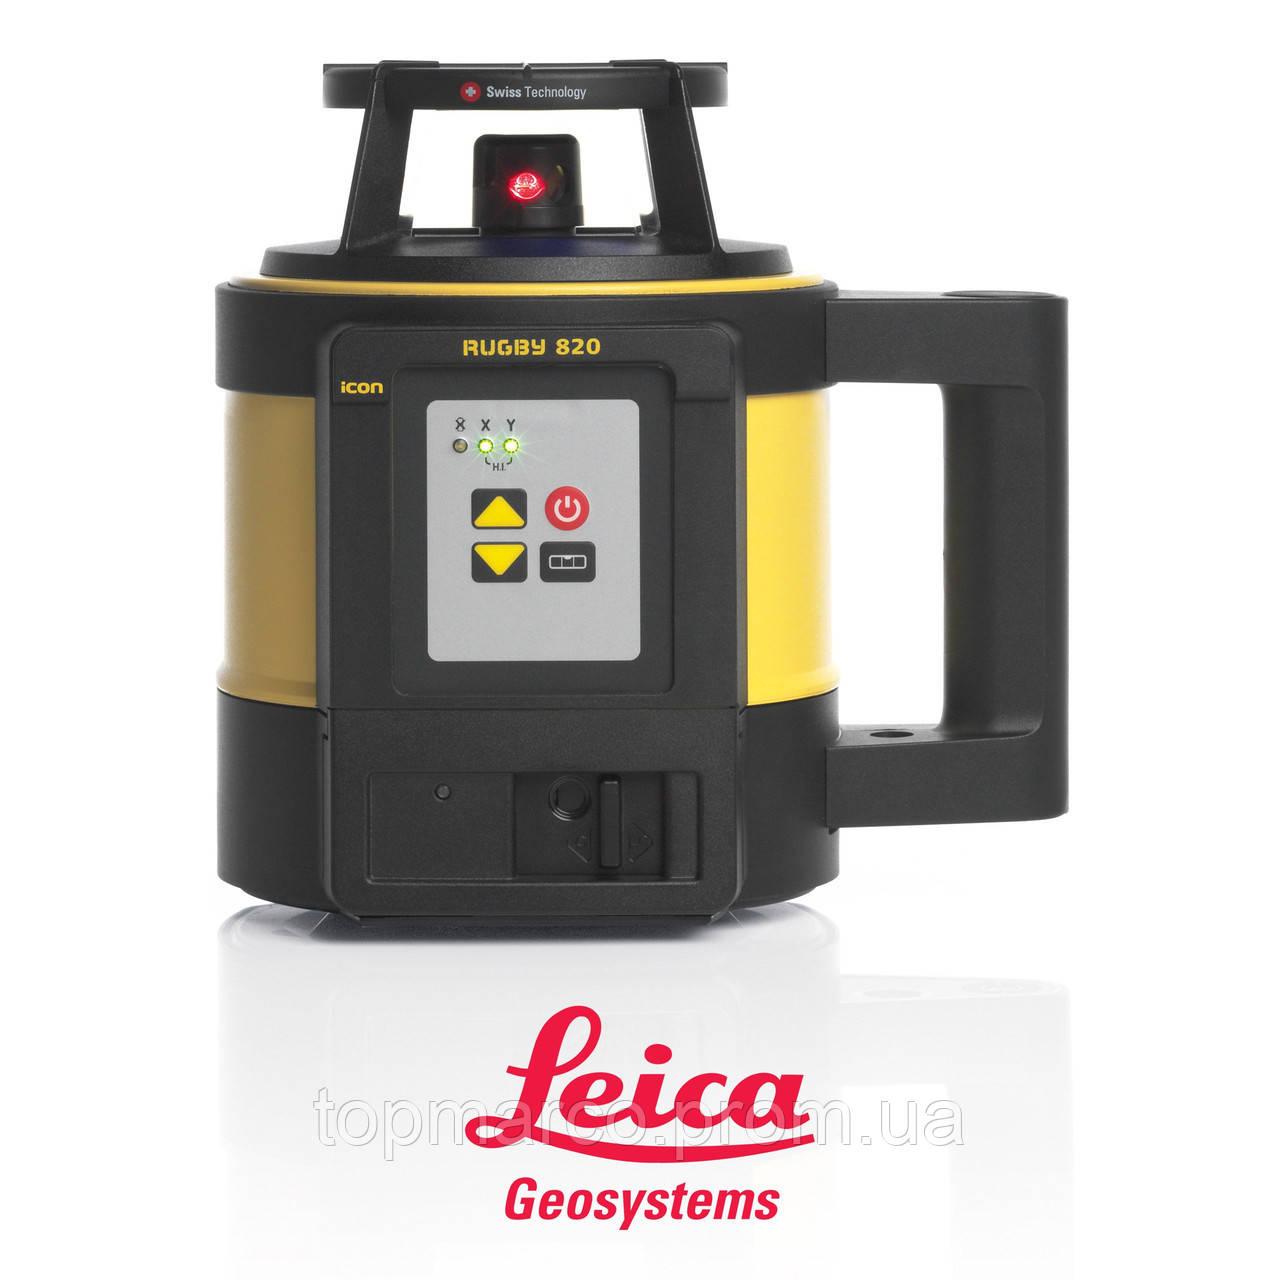 Лазерный нивелир Leica Rugby 820 RE160 + батарея